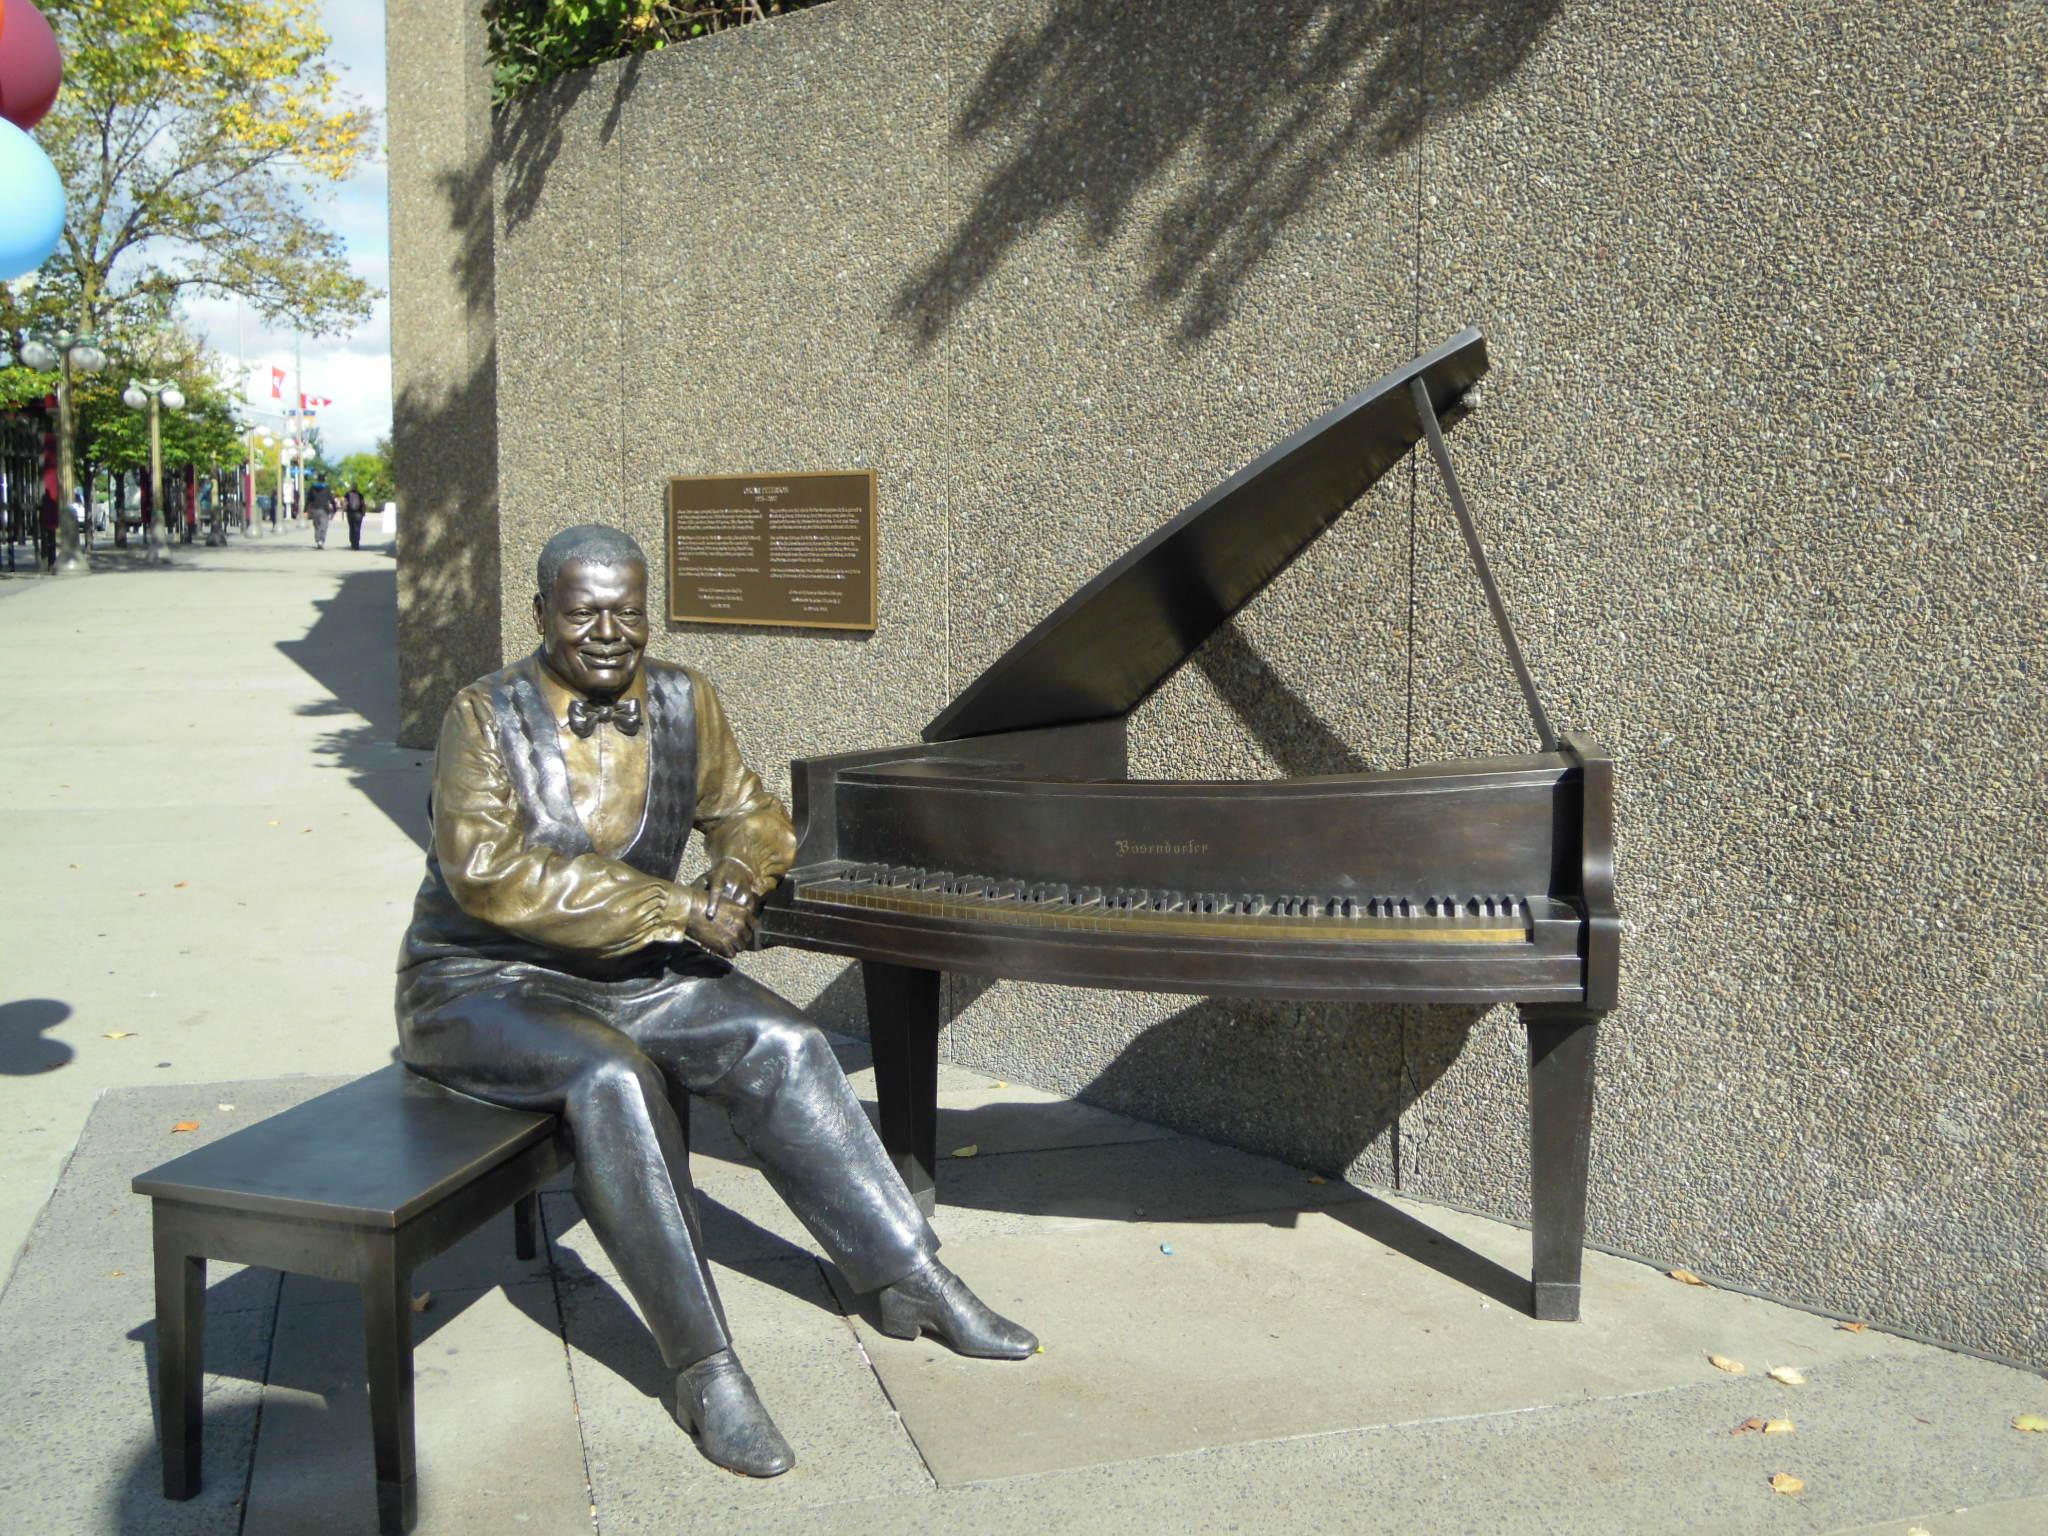 The Oscar Peterson Trio A Jazz Portrait Of Frank Sinatra